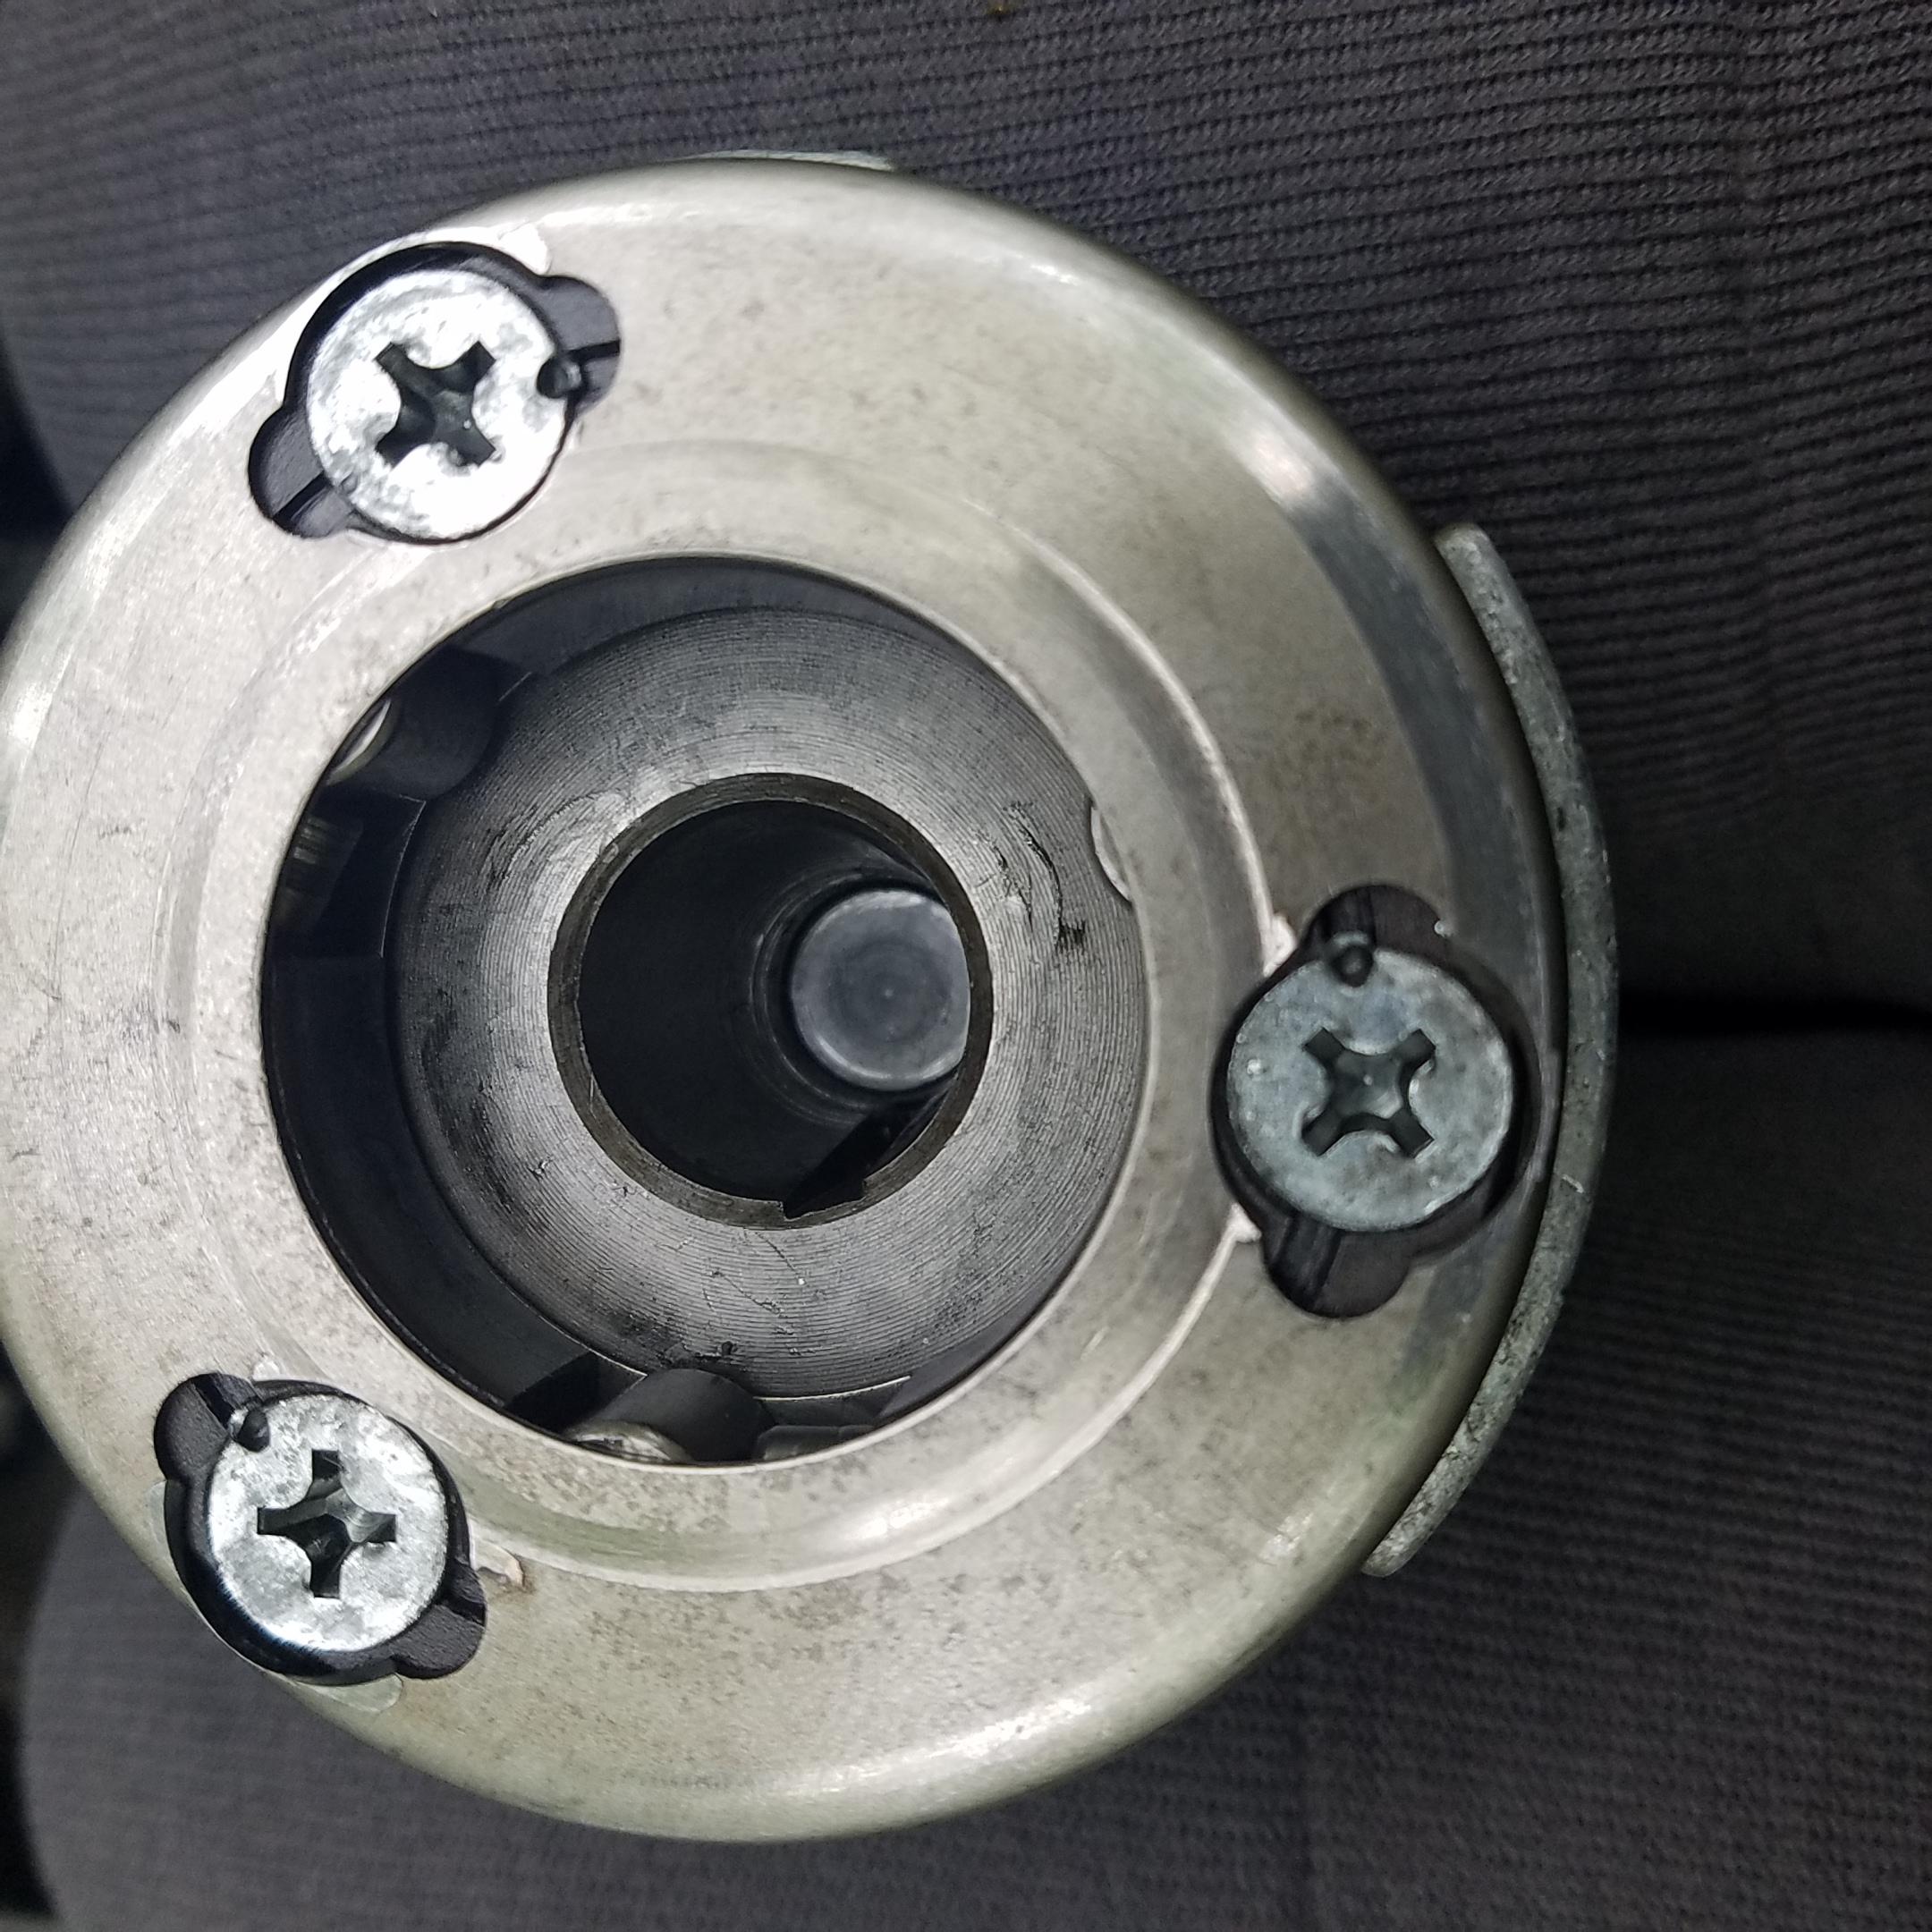 Piece of Aluminum found in old oil-20190529_120653_1559231467135.jpg